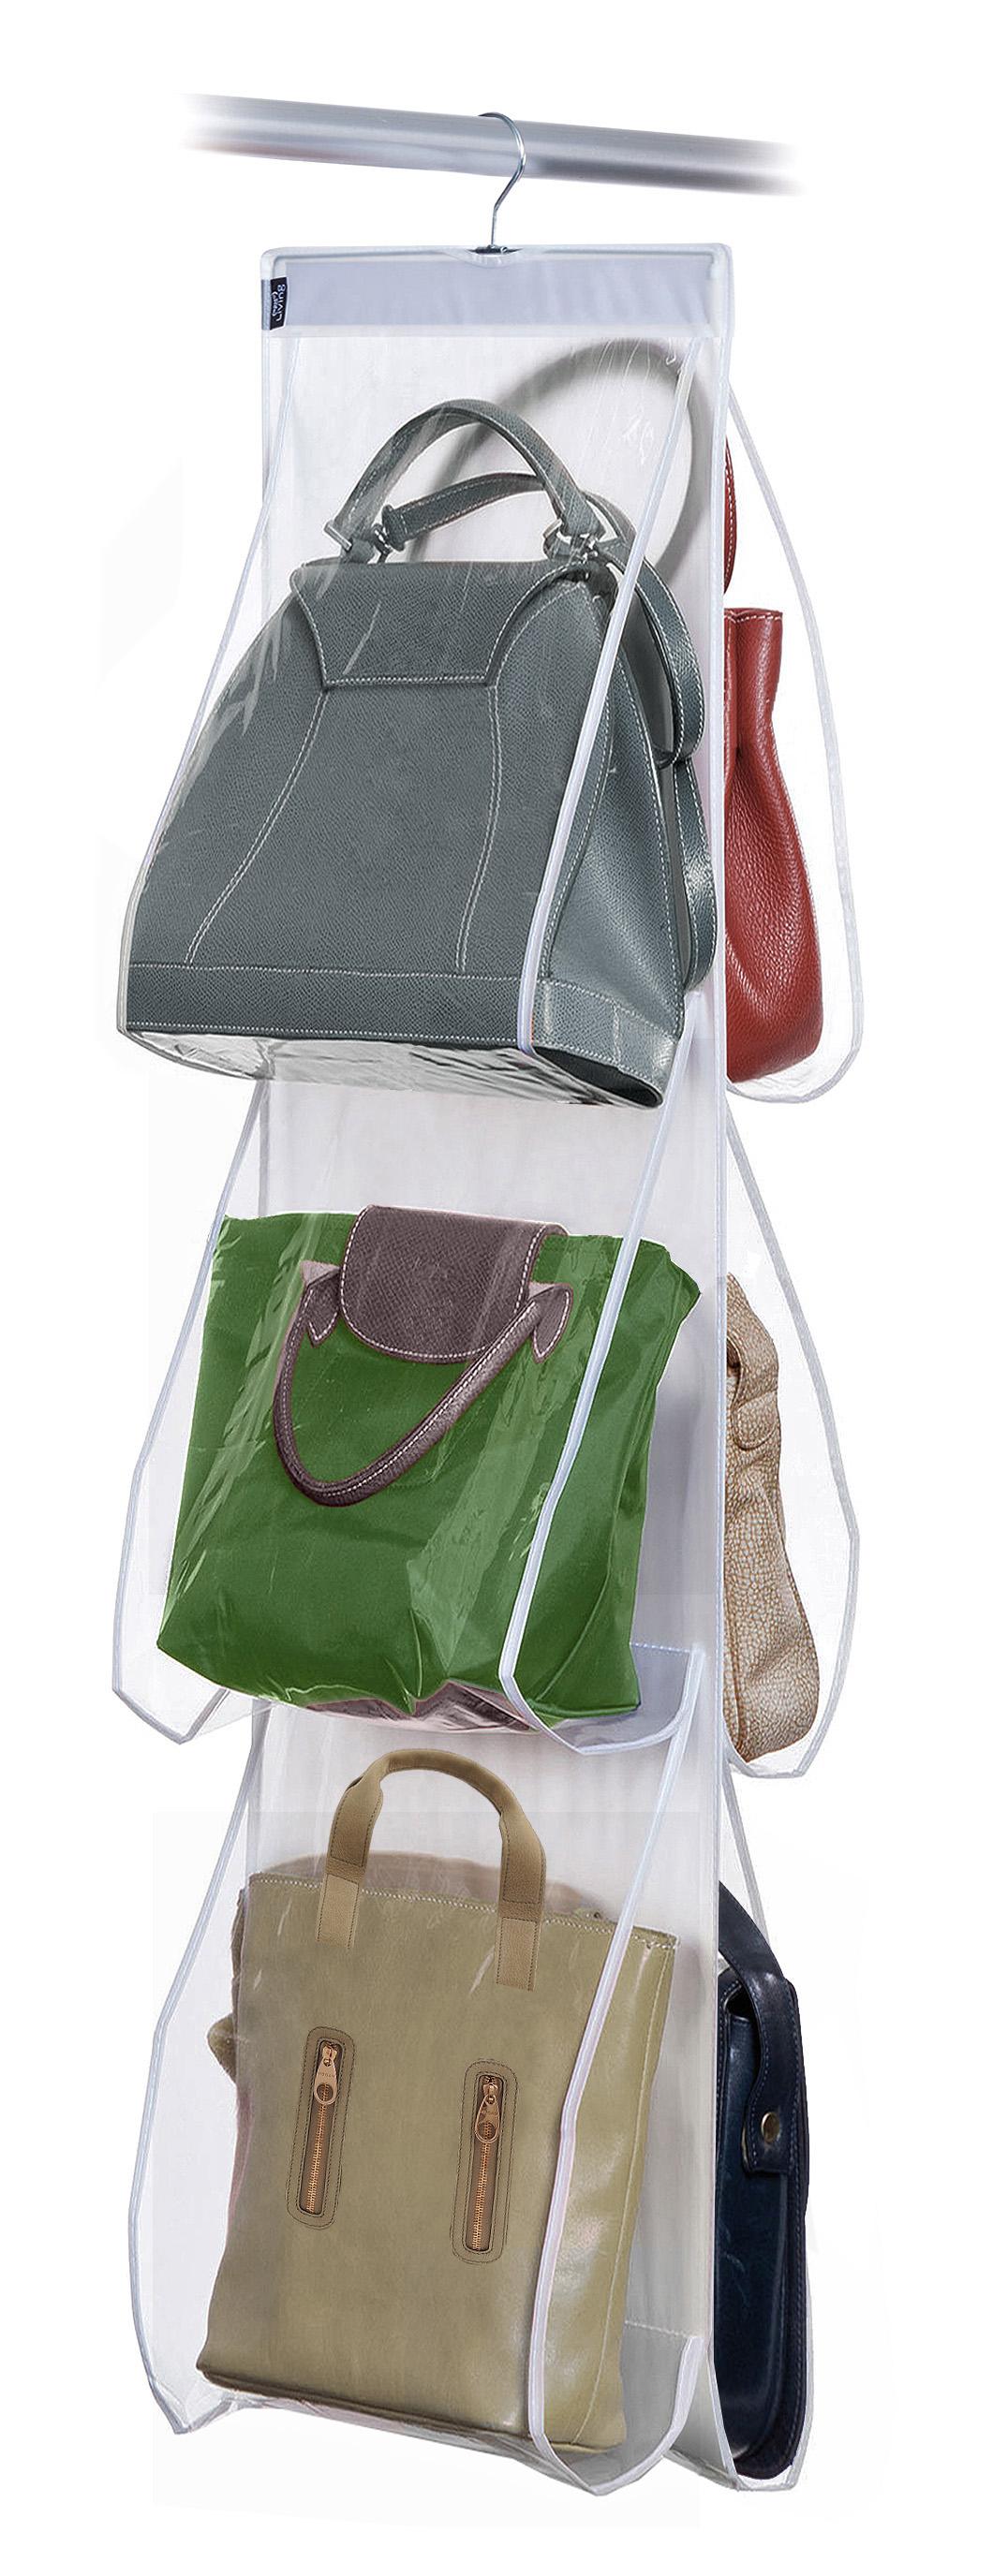 DOMOPAK Living Závěsný organizér na kabelky s 6 kapsami